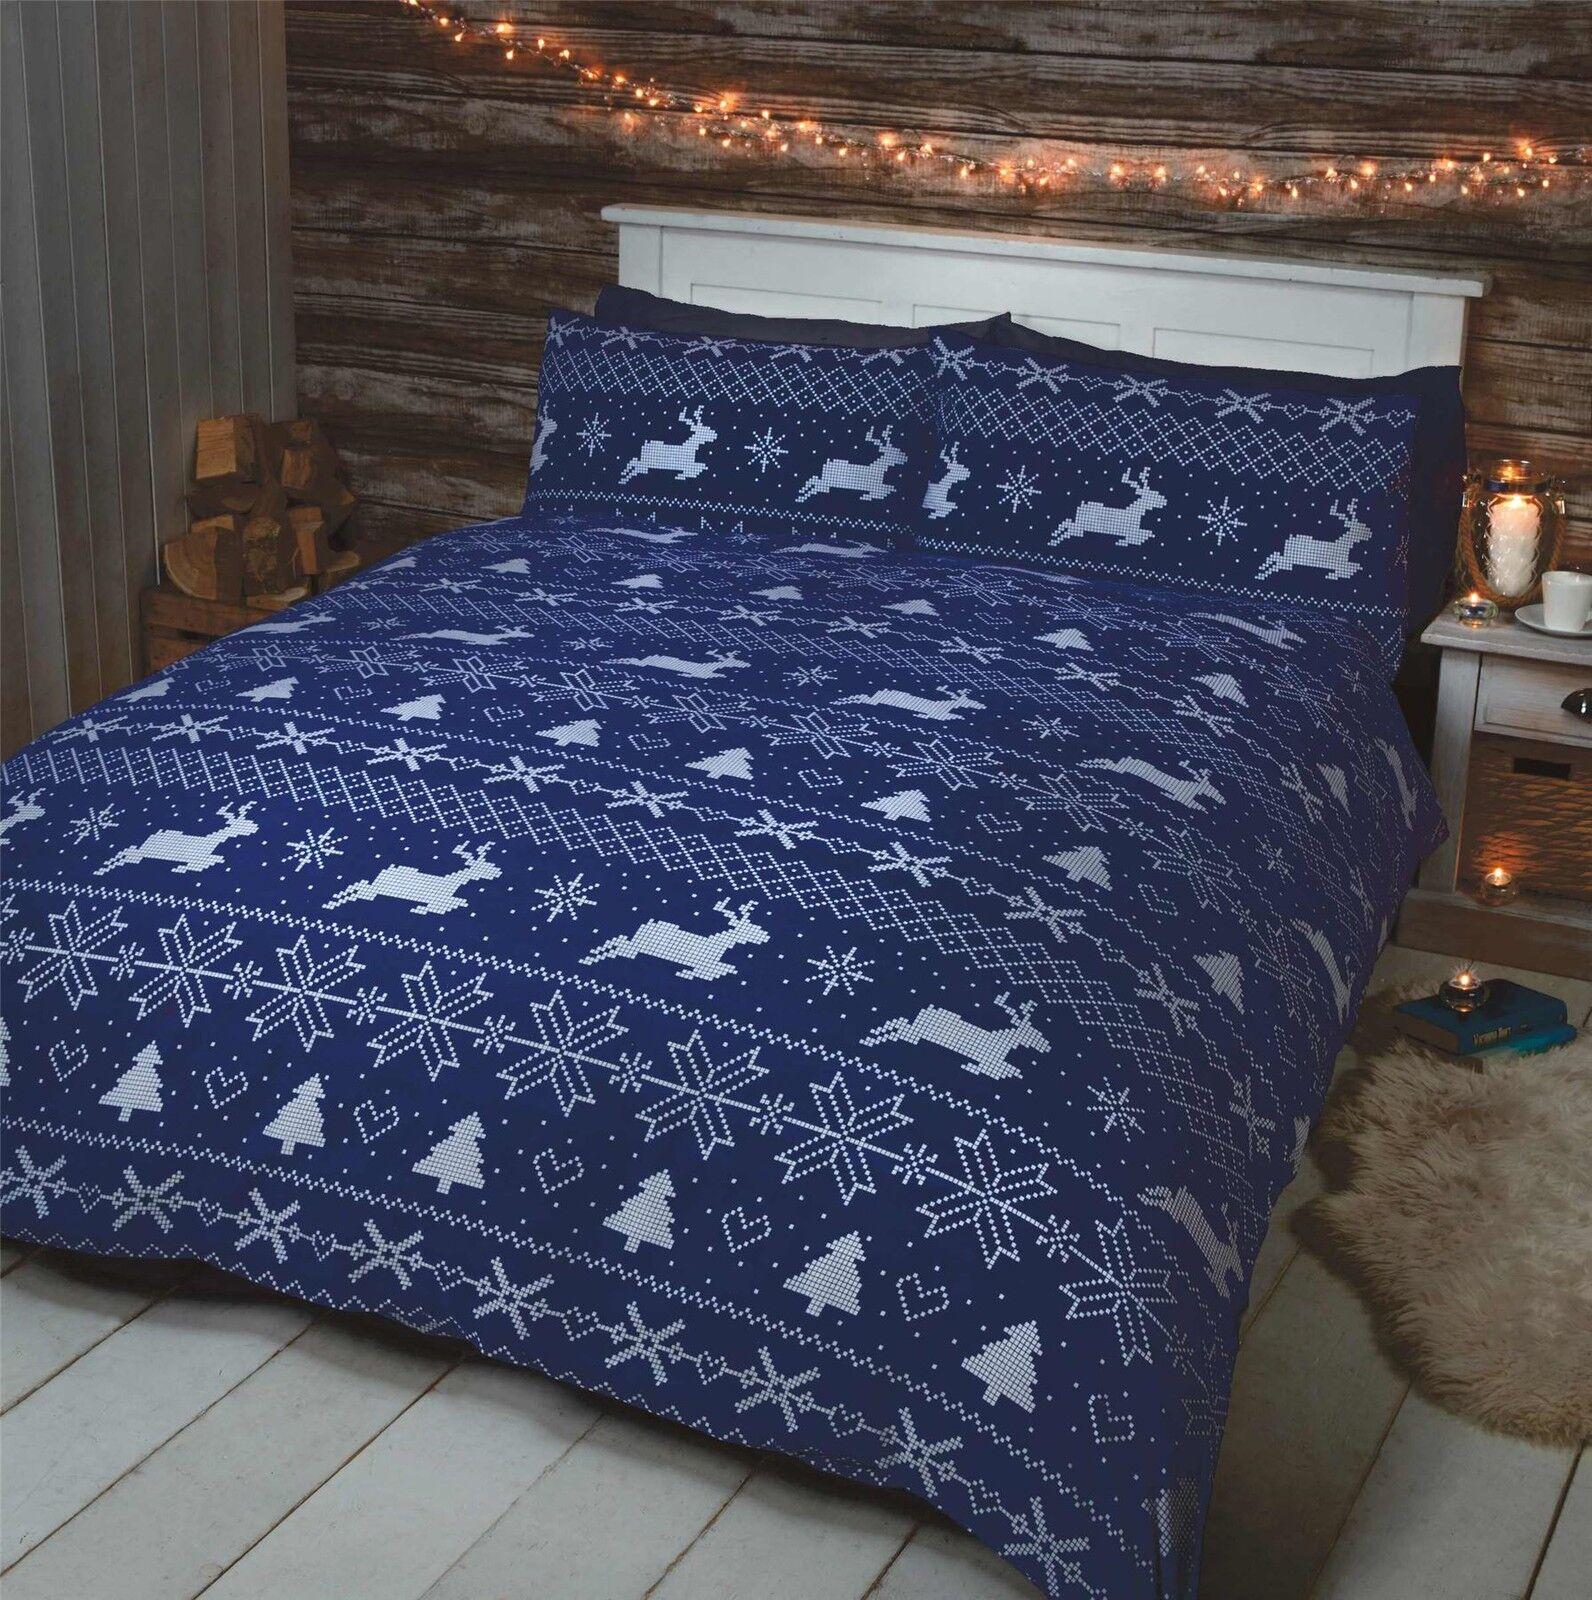 NORDIC CHRISTMAS REINDEER NAVY blueE WHITE 100% BRUSHED SUPER KING DUVET COVER